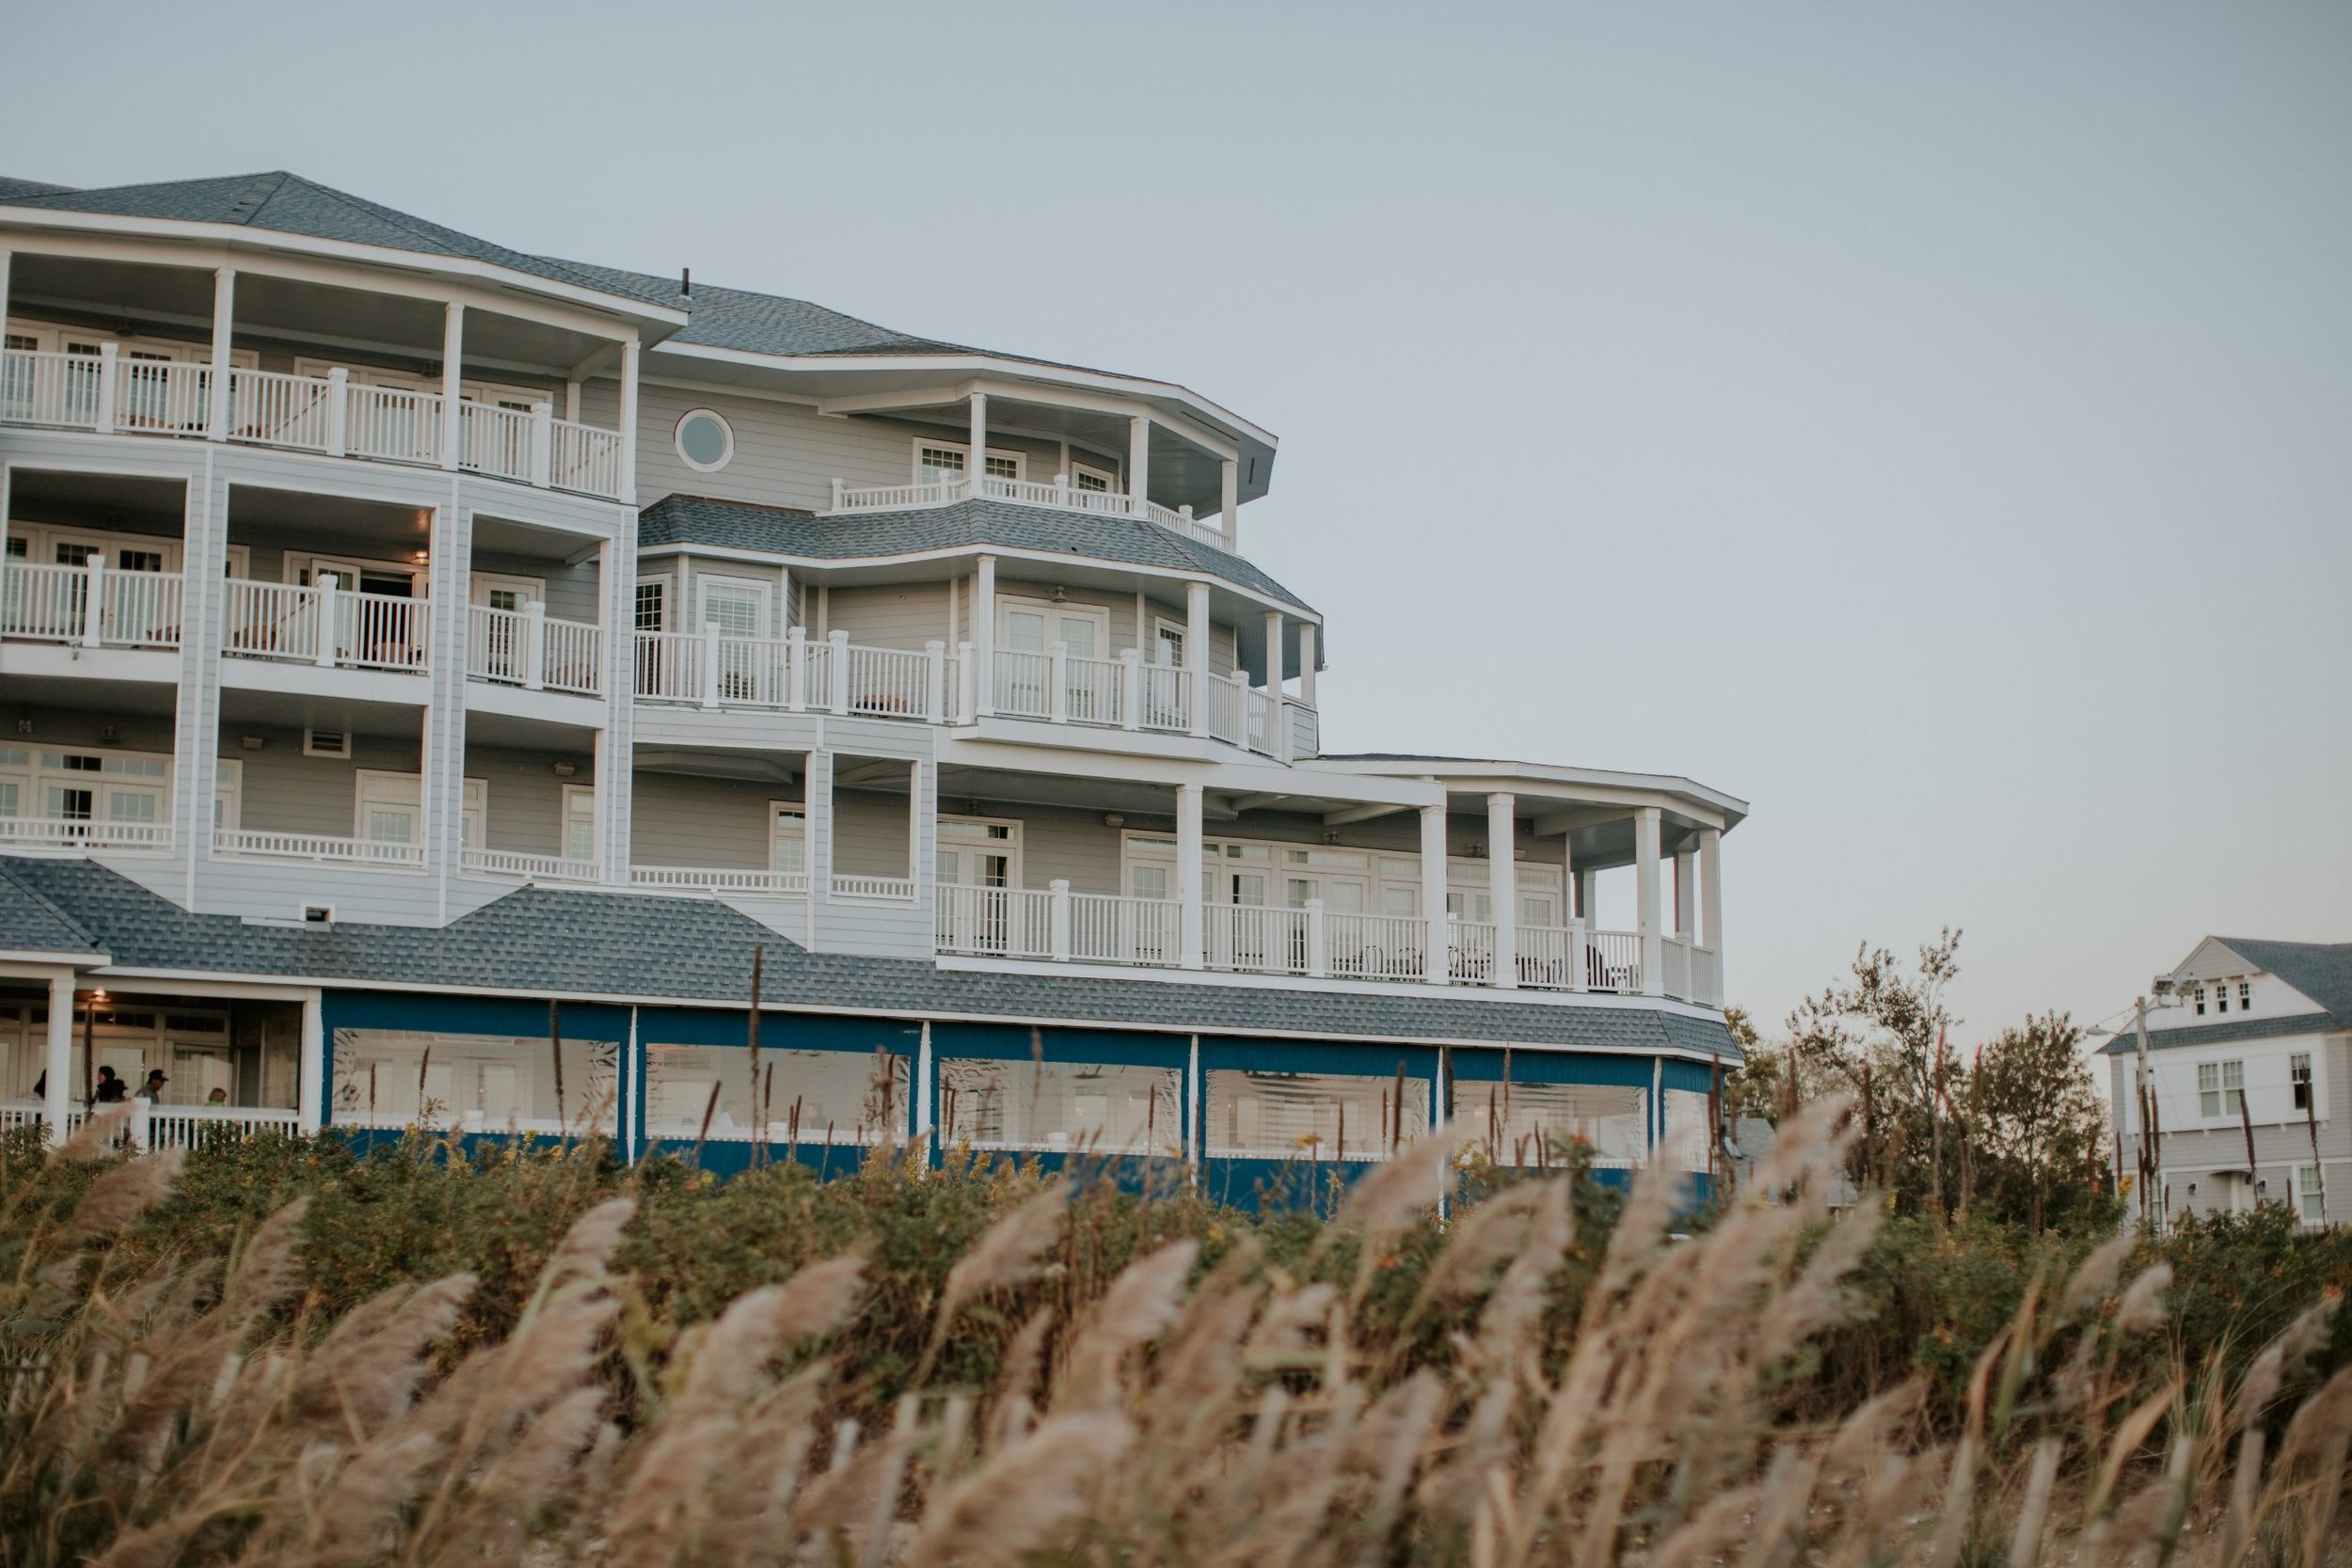 madison-beach-hotel-coastal-rose-gold-daylynn-designs-127.jpg